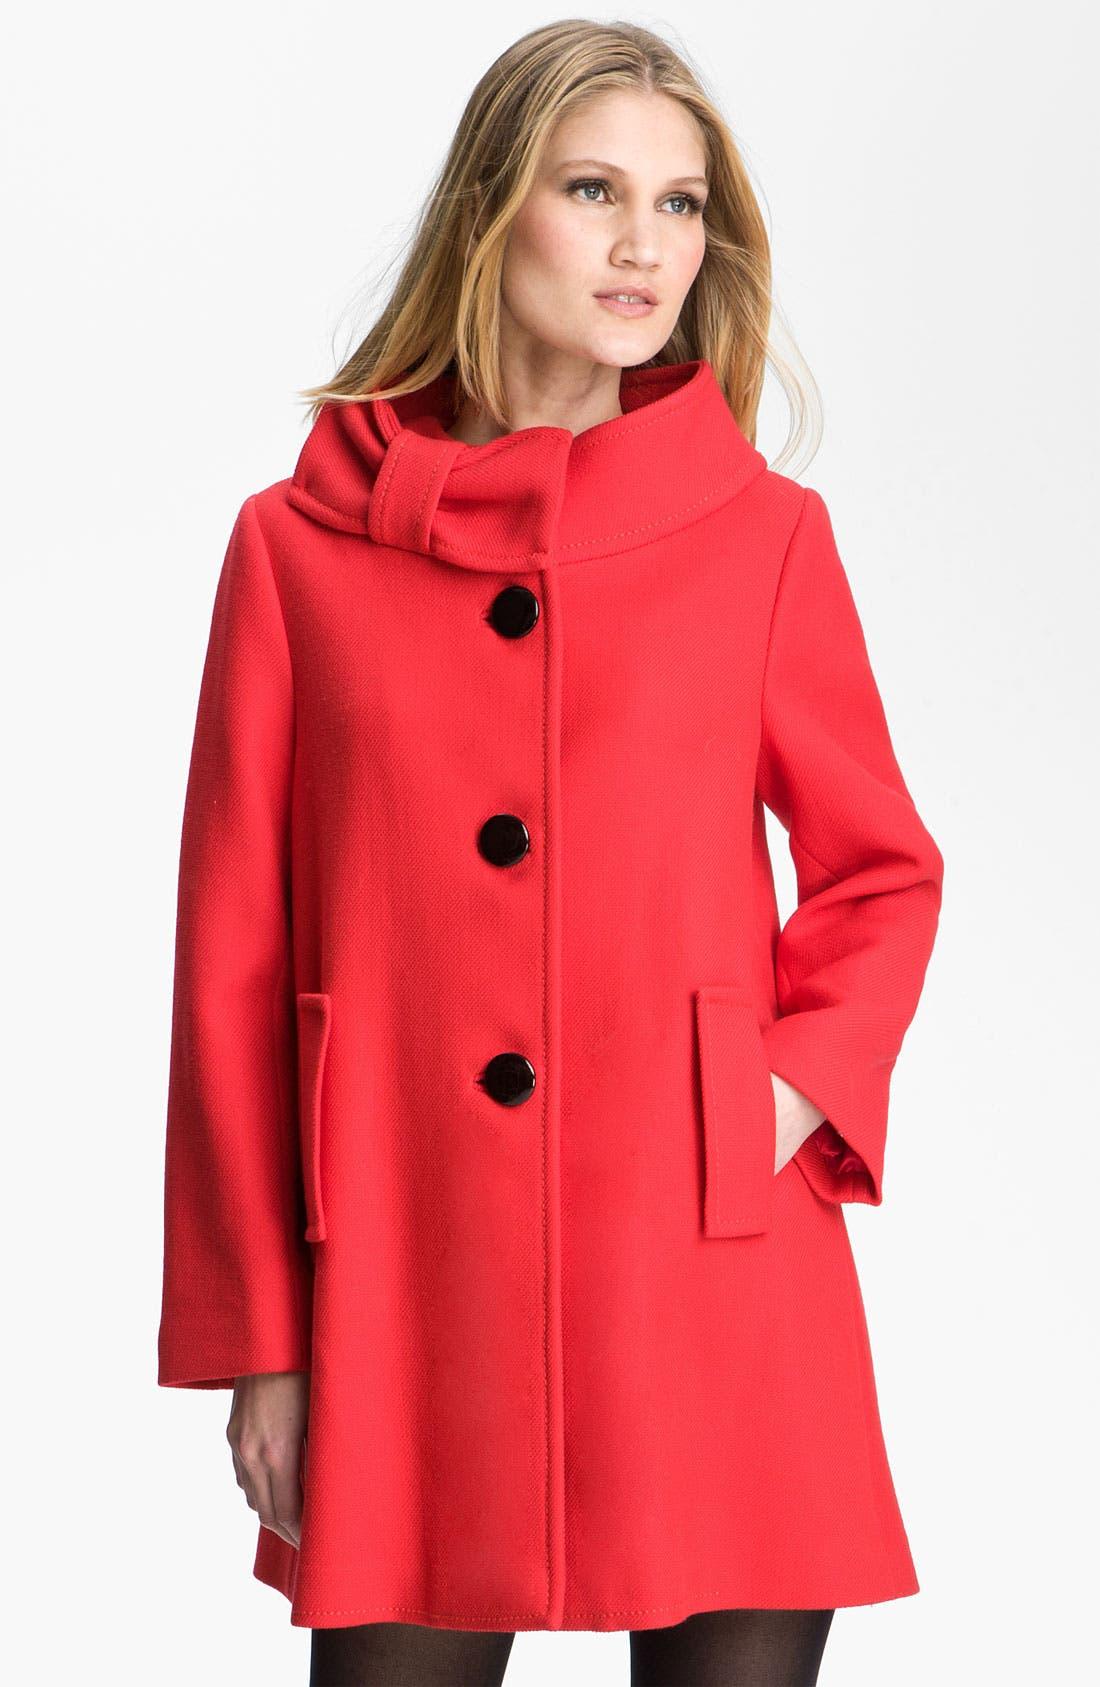 Alternate Image 1 Selected - kate spade new york 'suzette' coat